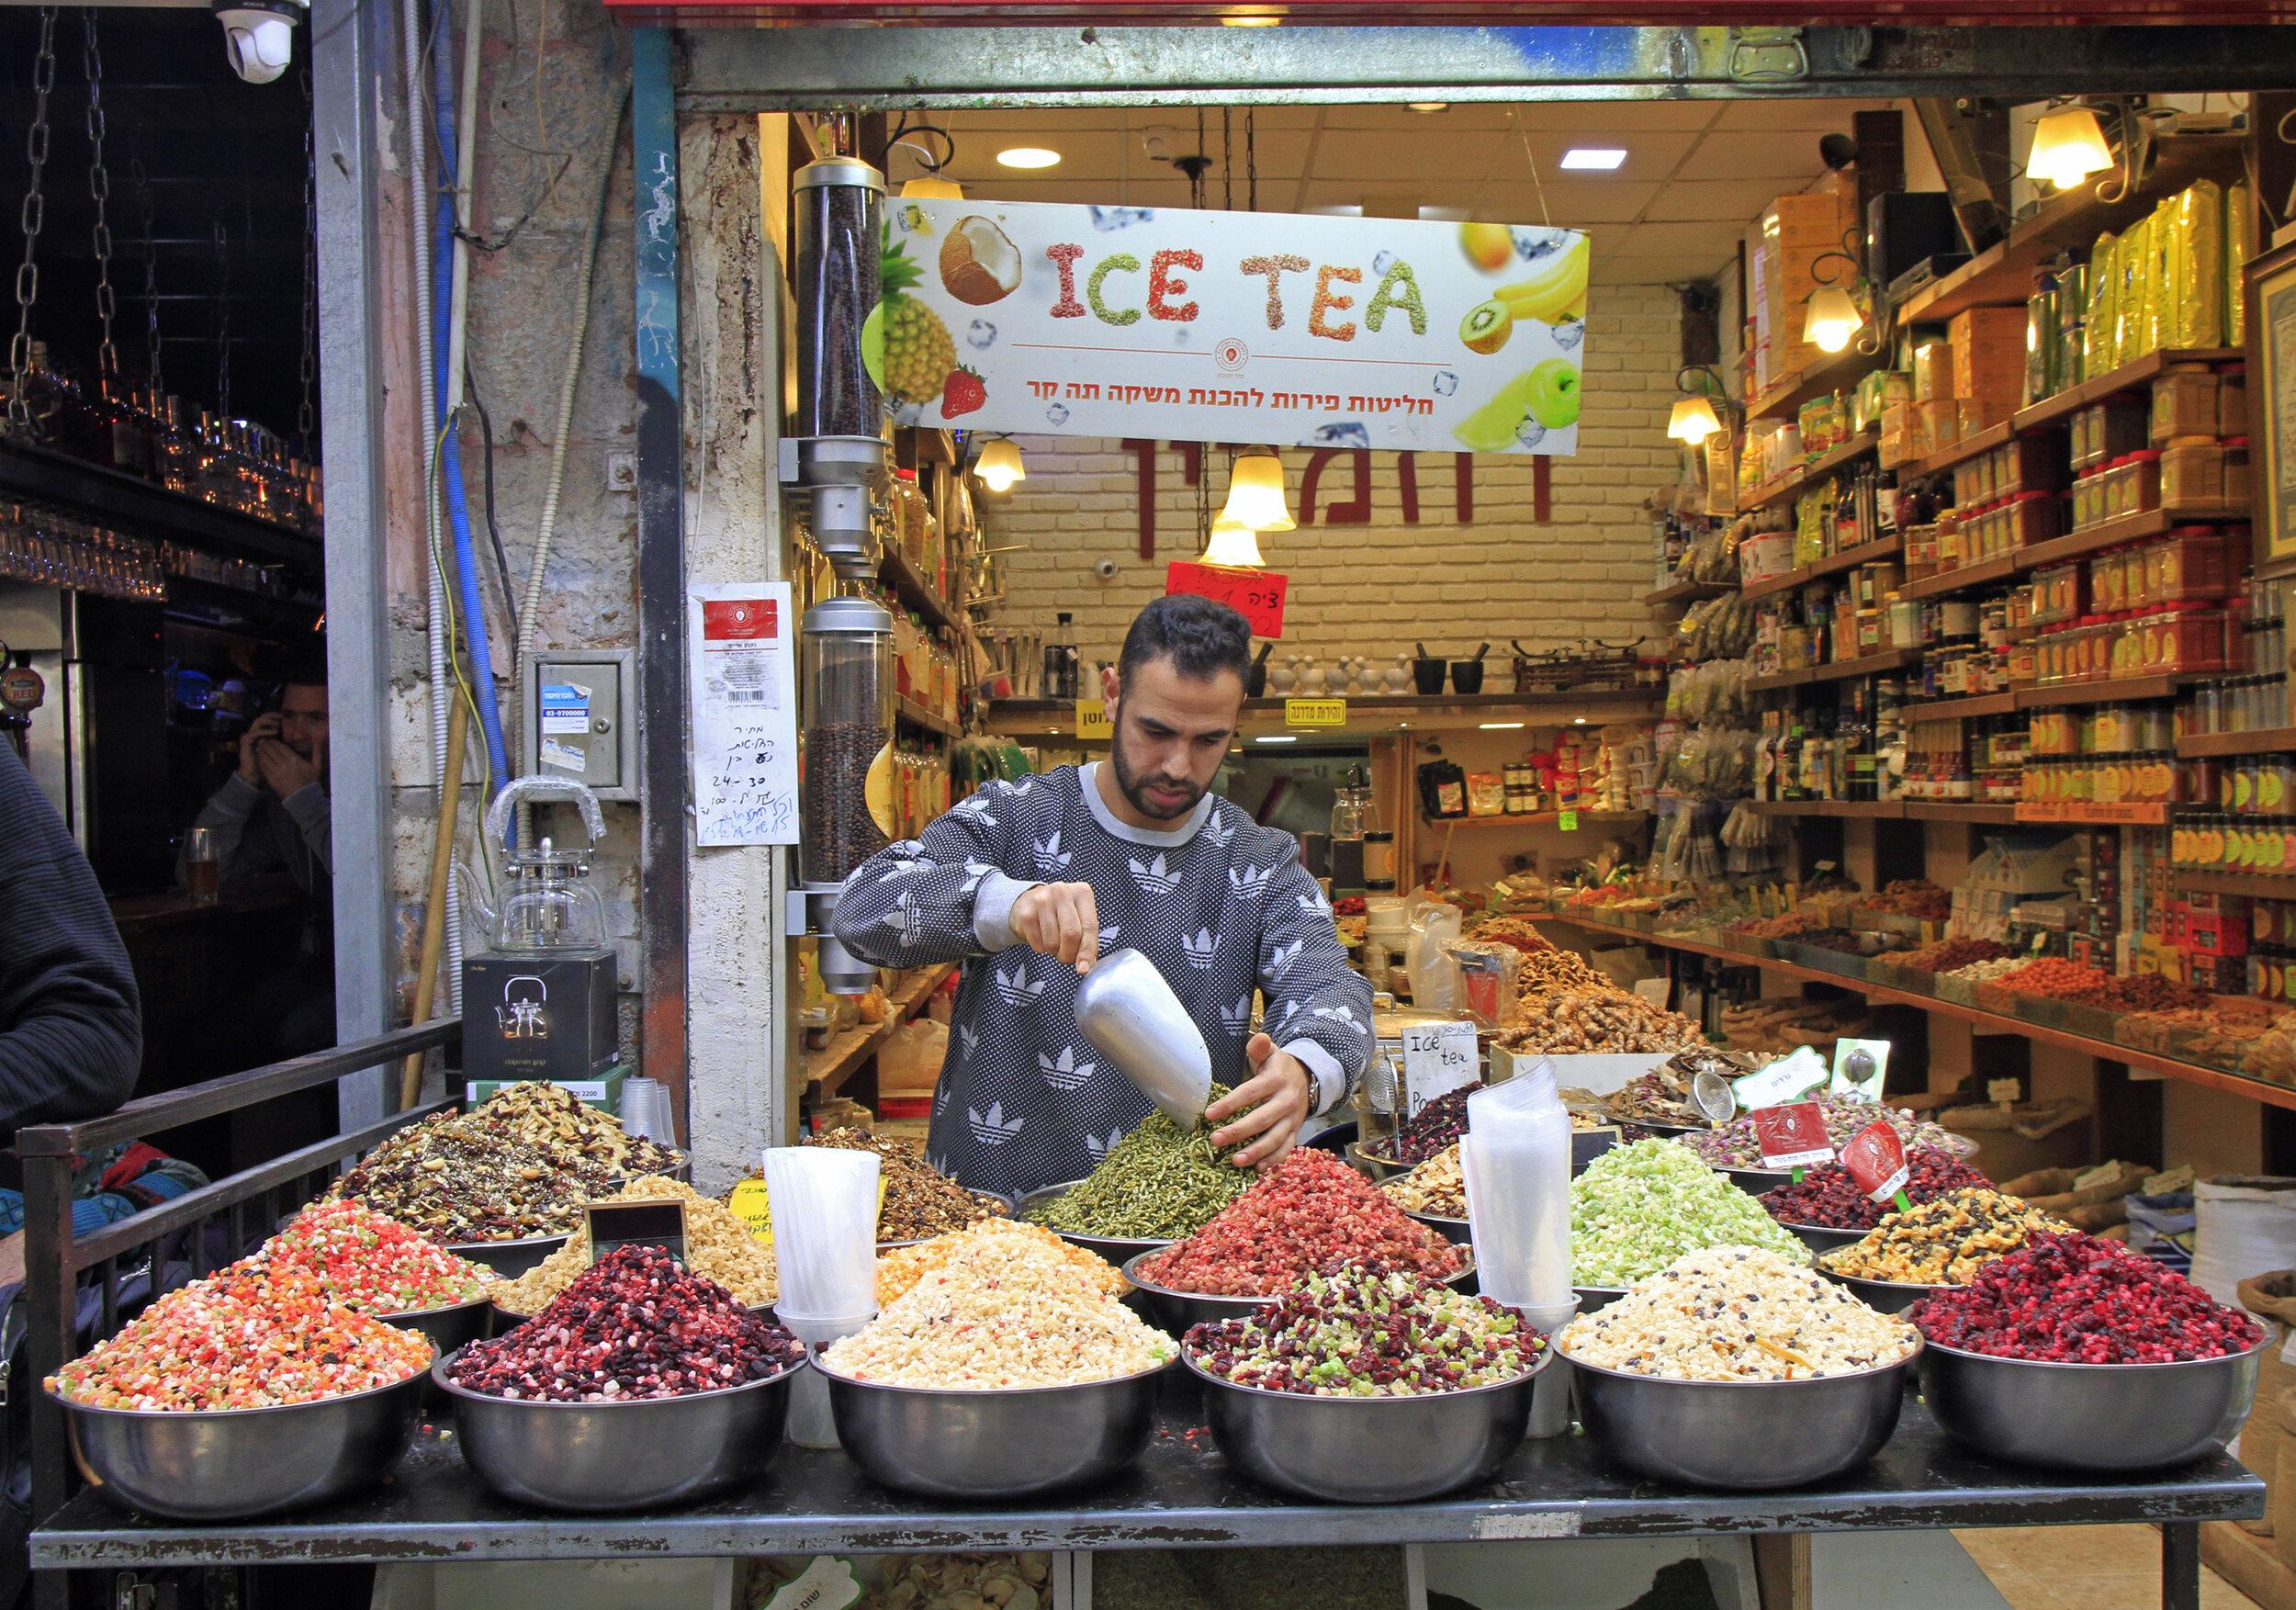 Tea vendor at Mahane Yehuda market in Jerusalem.